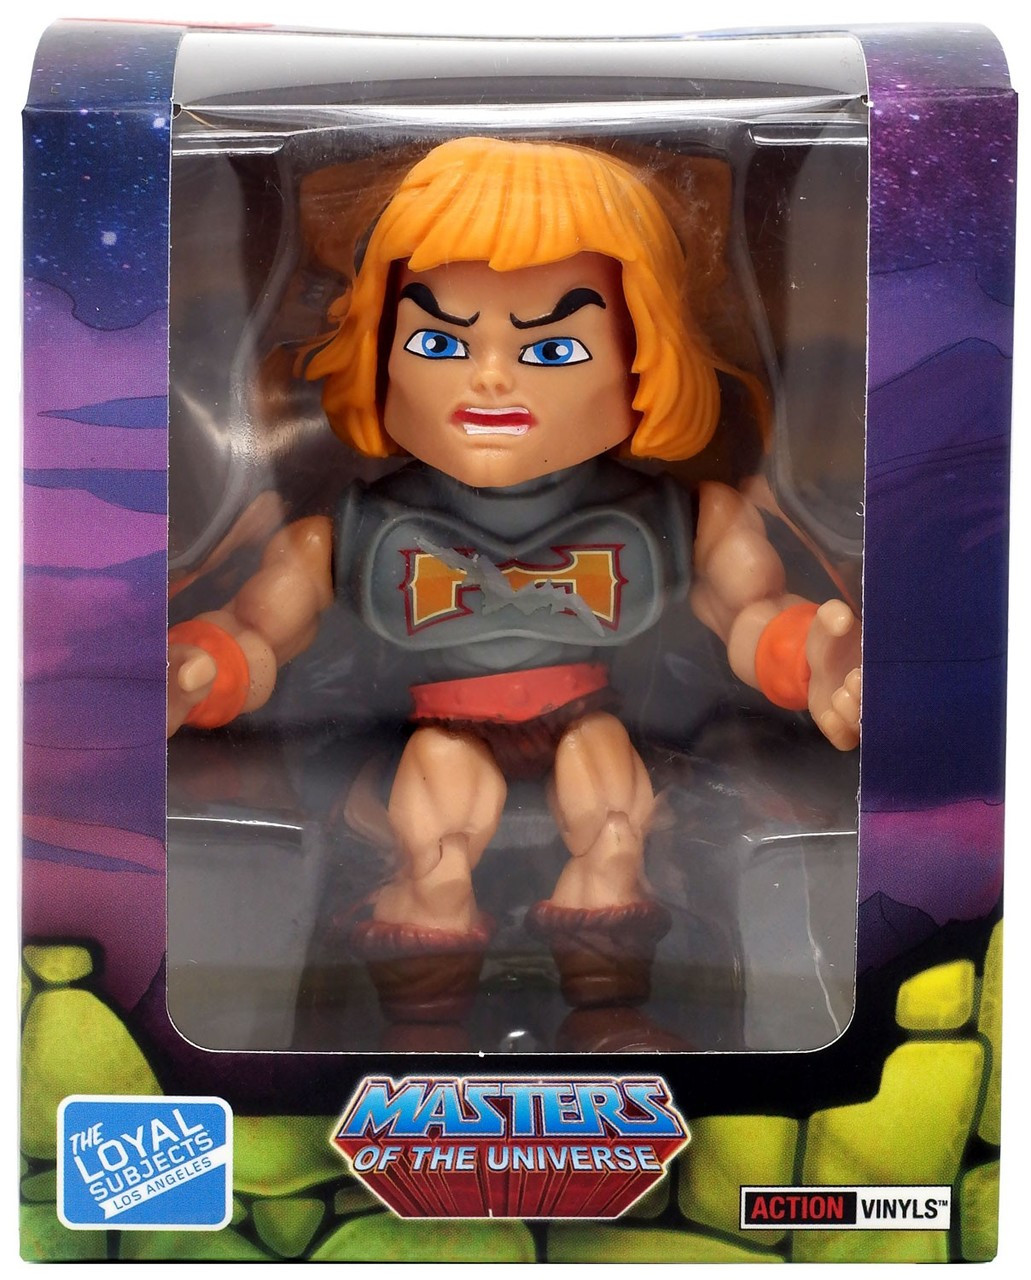 MASTER OF THE UNIVERSE HE-MAN HE MAN HEMAN POP FUNKO FIGURE MOTU SKELETOR #1